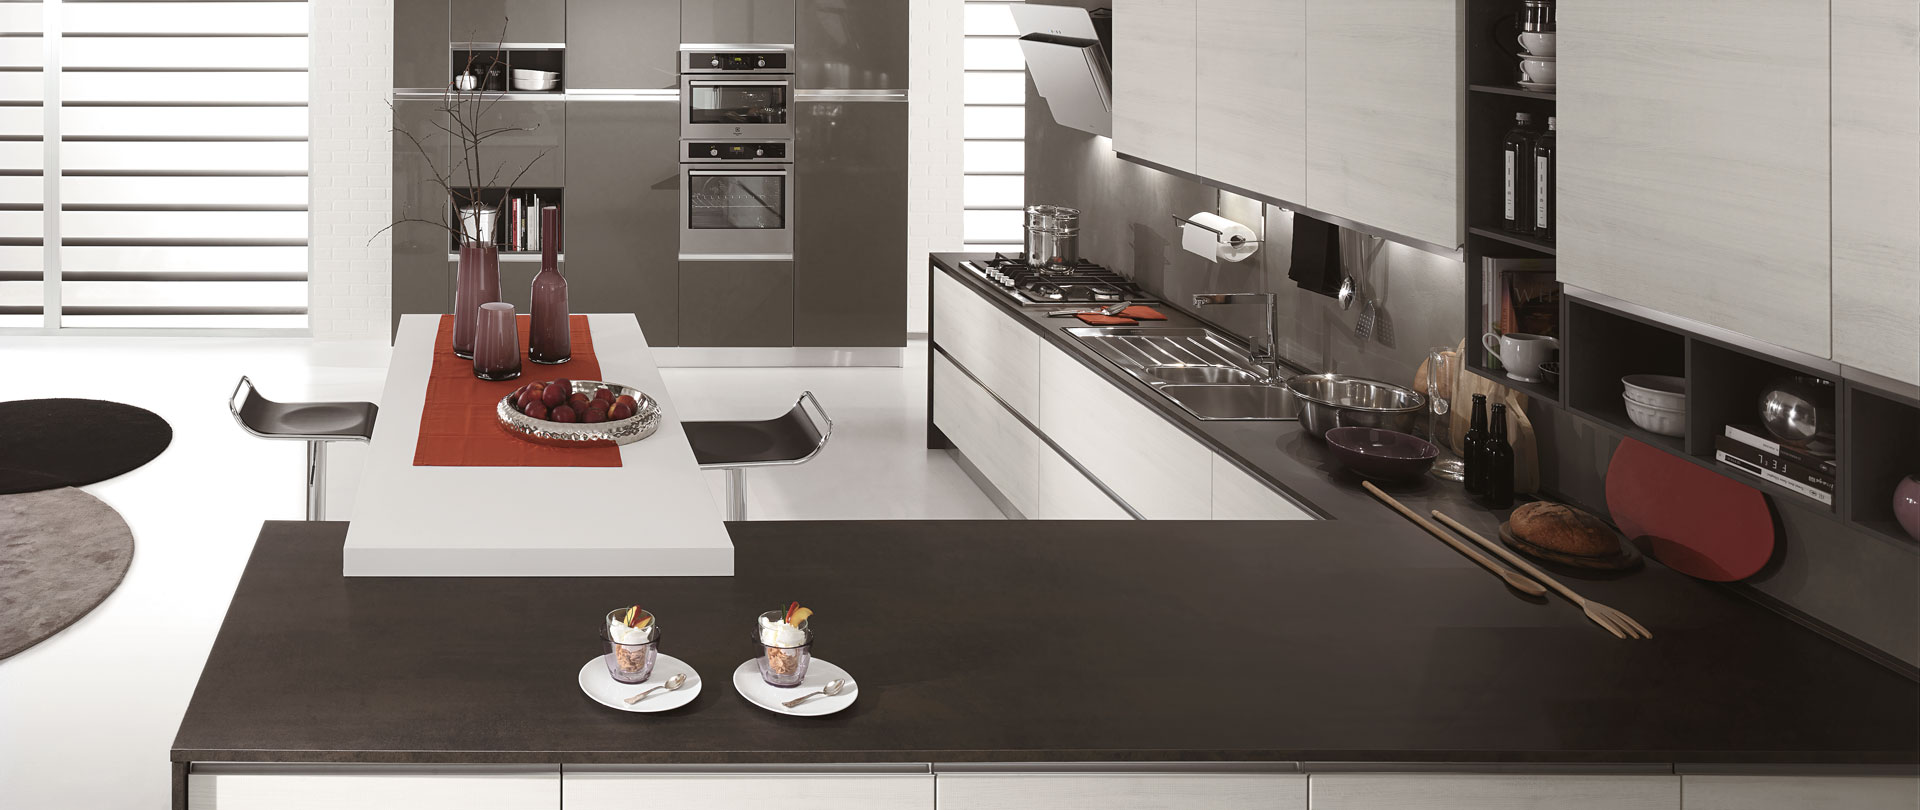 02-cucina-moderna-newmeg-tranche-ghiaccio-grigio-polvere.jpg